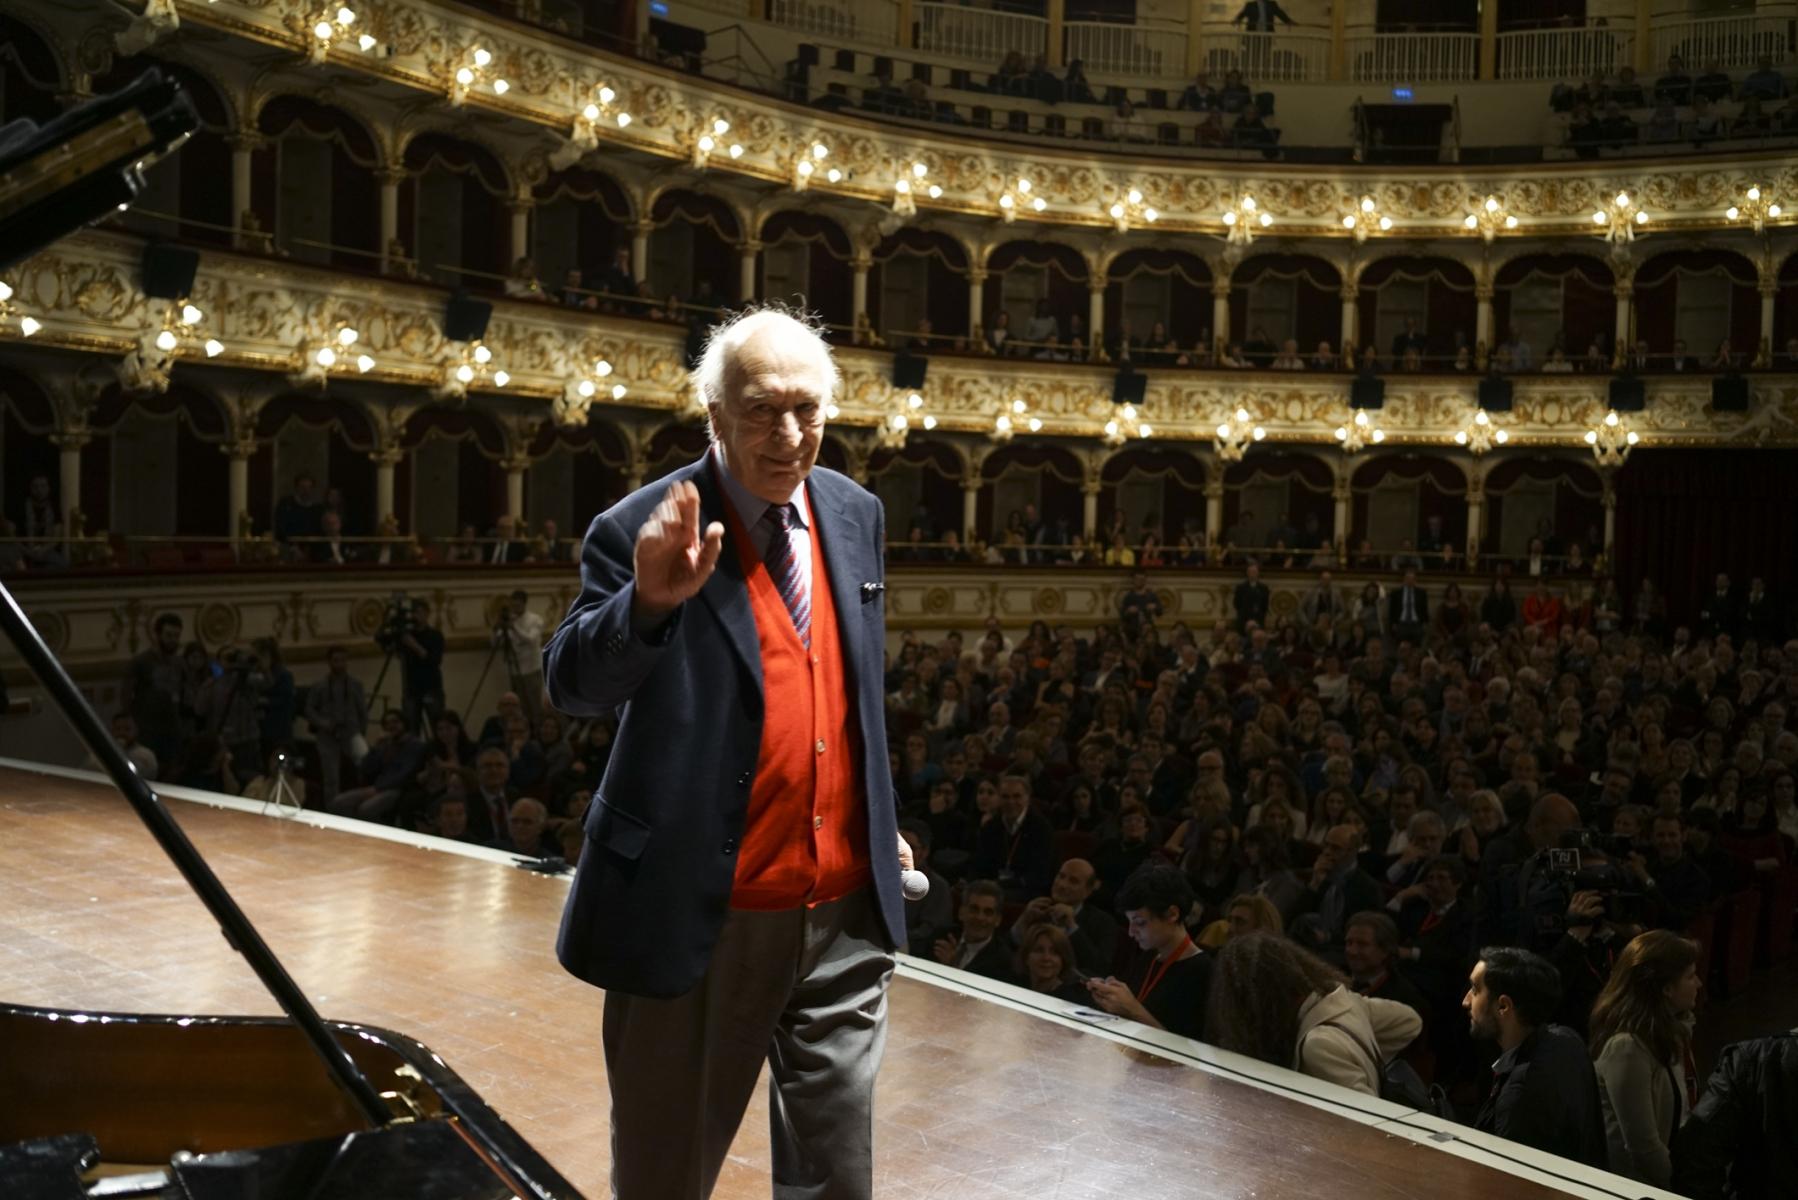 Giuliano Montaldo on the stage